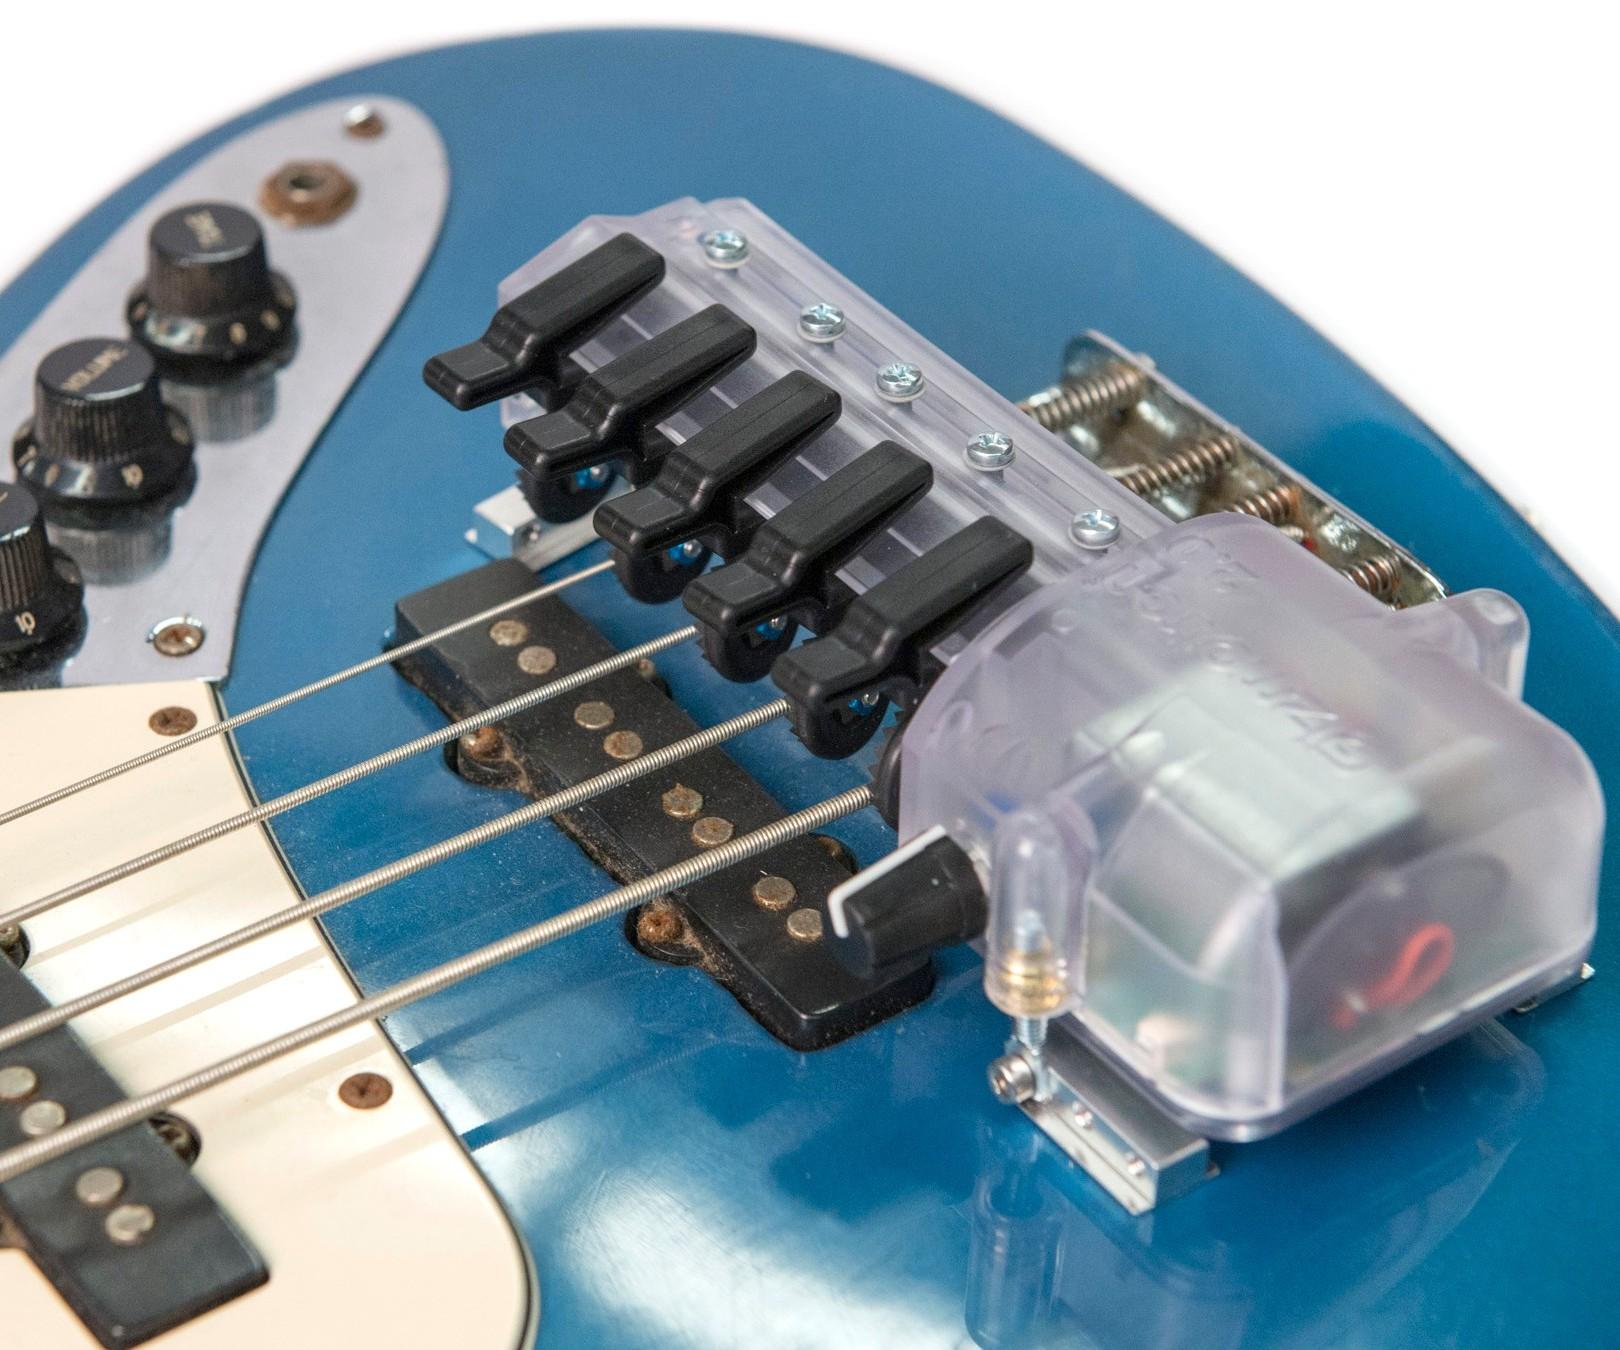 The Gizmotron 2.0 mounted on a bass guitar.